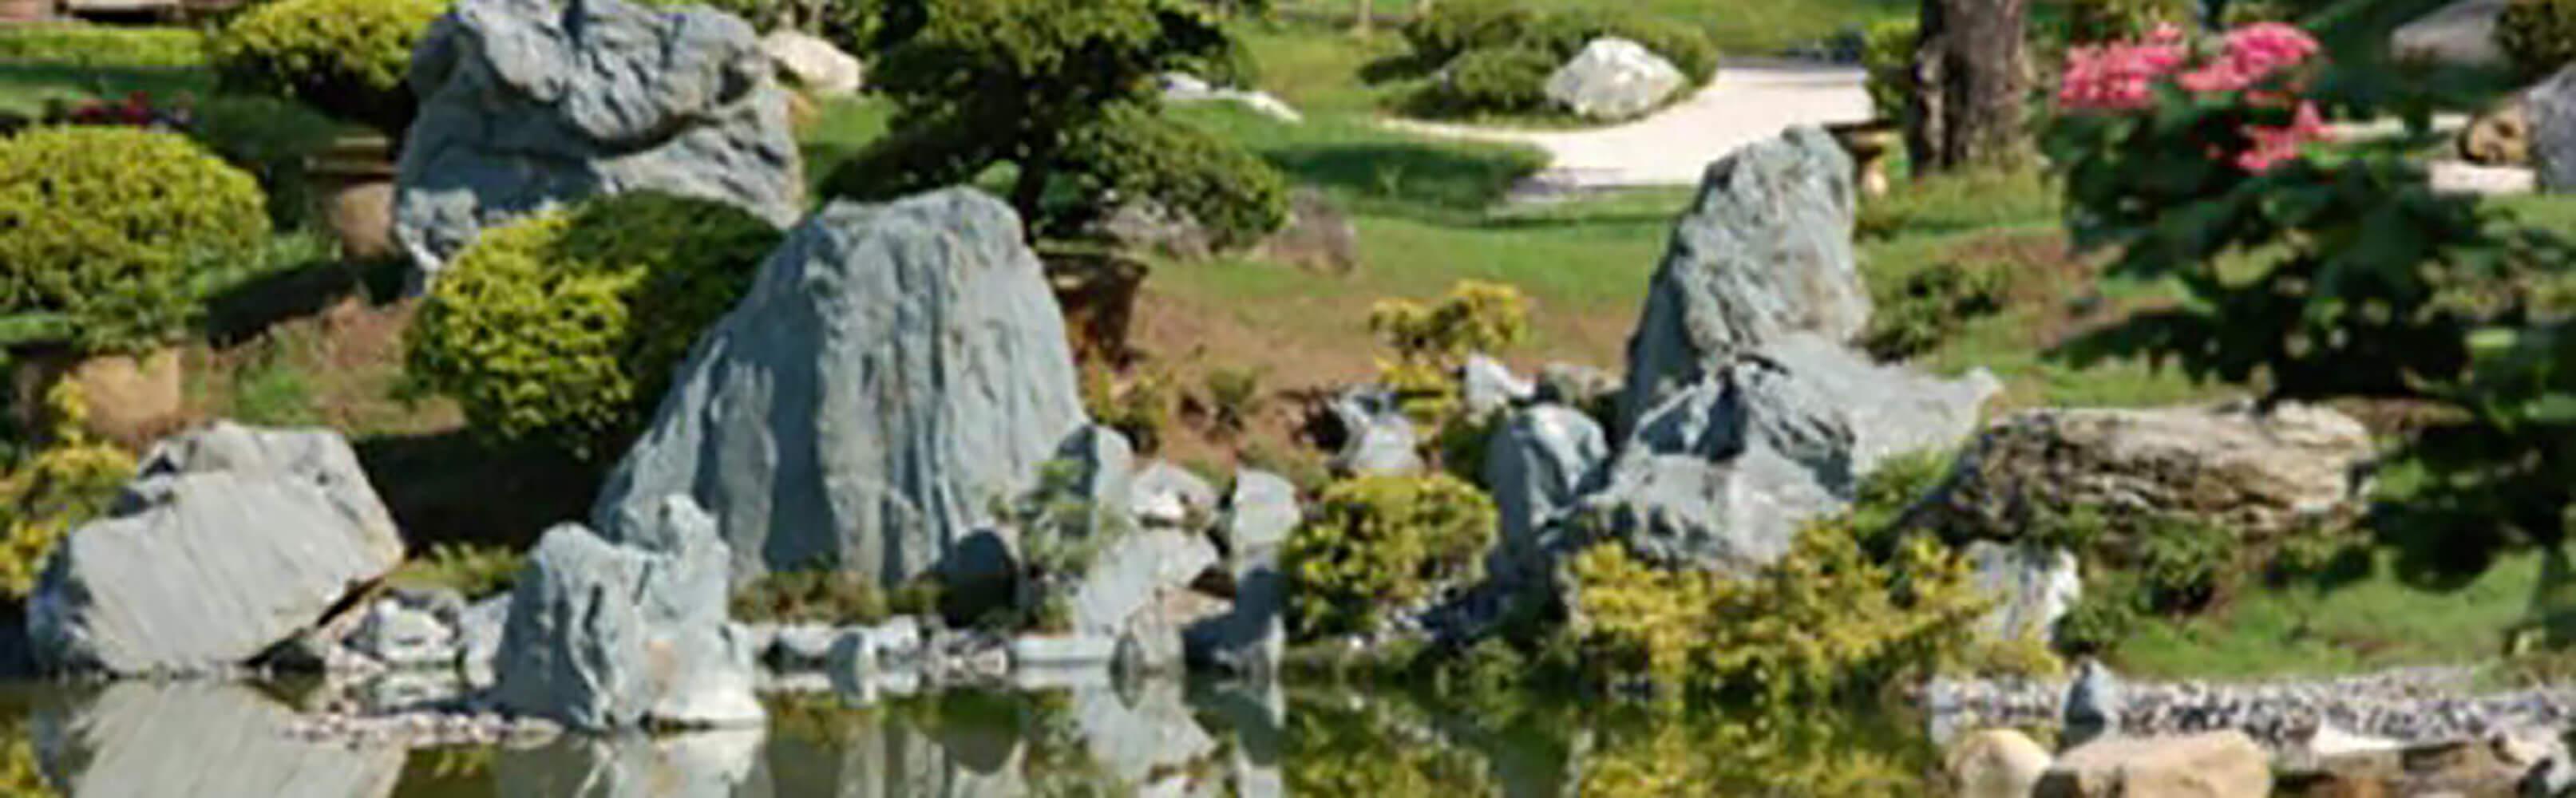 Bonsaimuseum 1